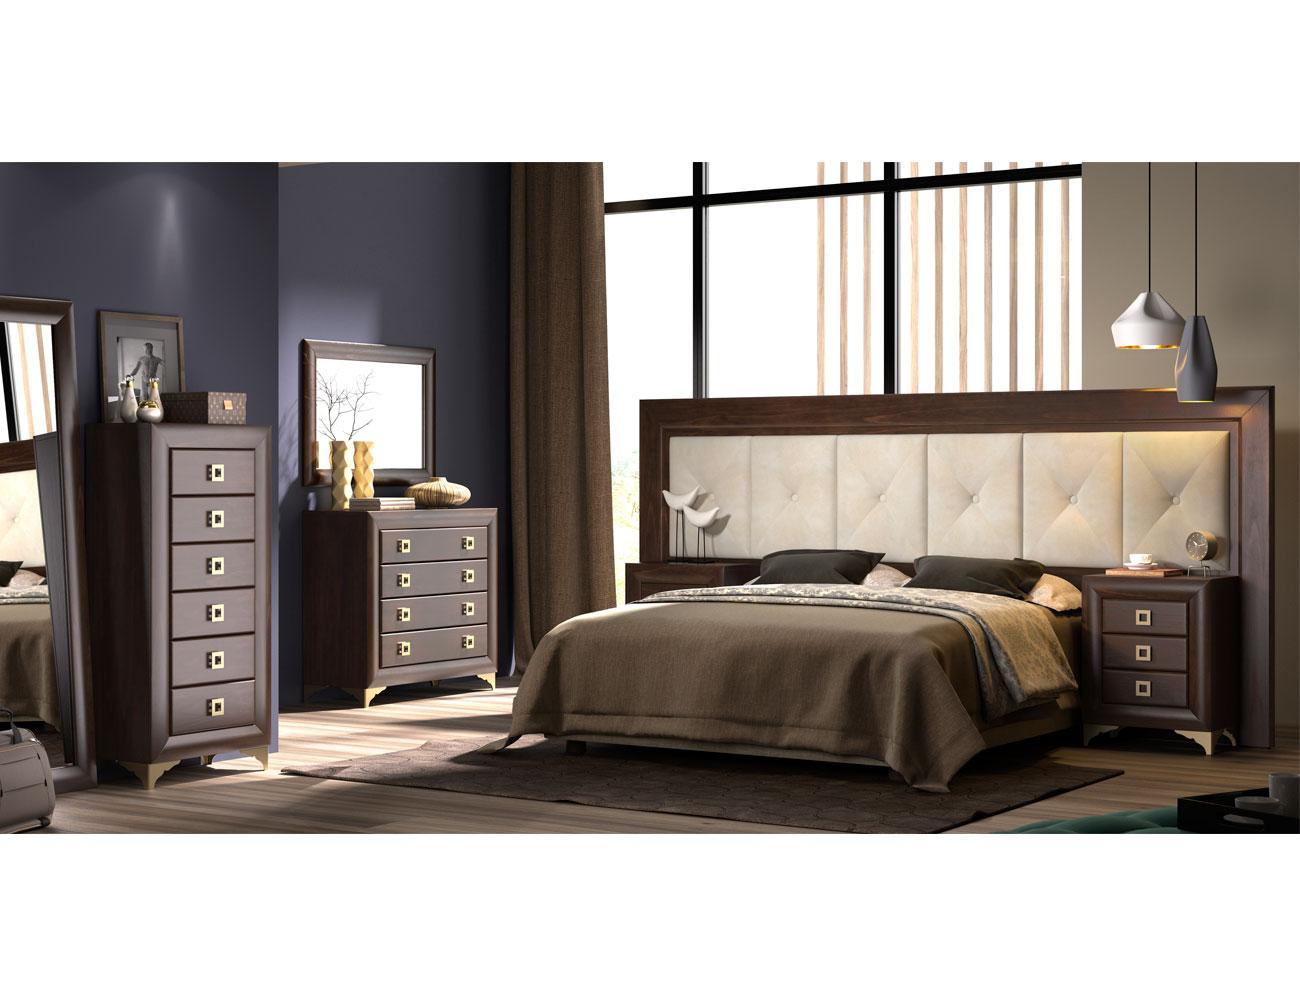 Dormitorio matrimonio nogal tapizado patas cabecero 285cm3